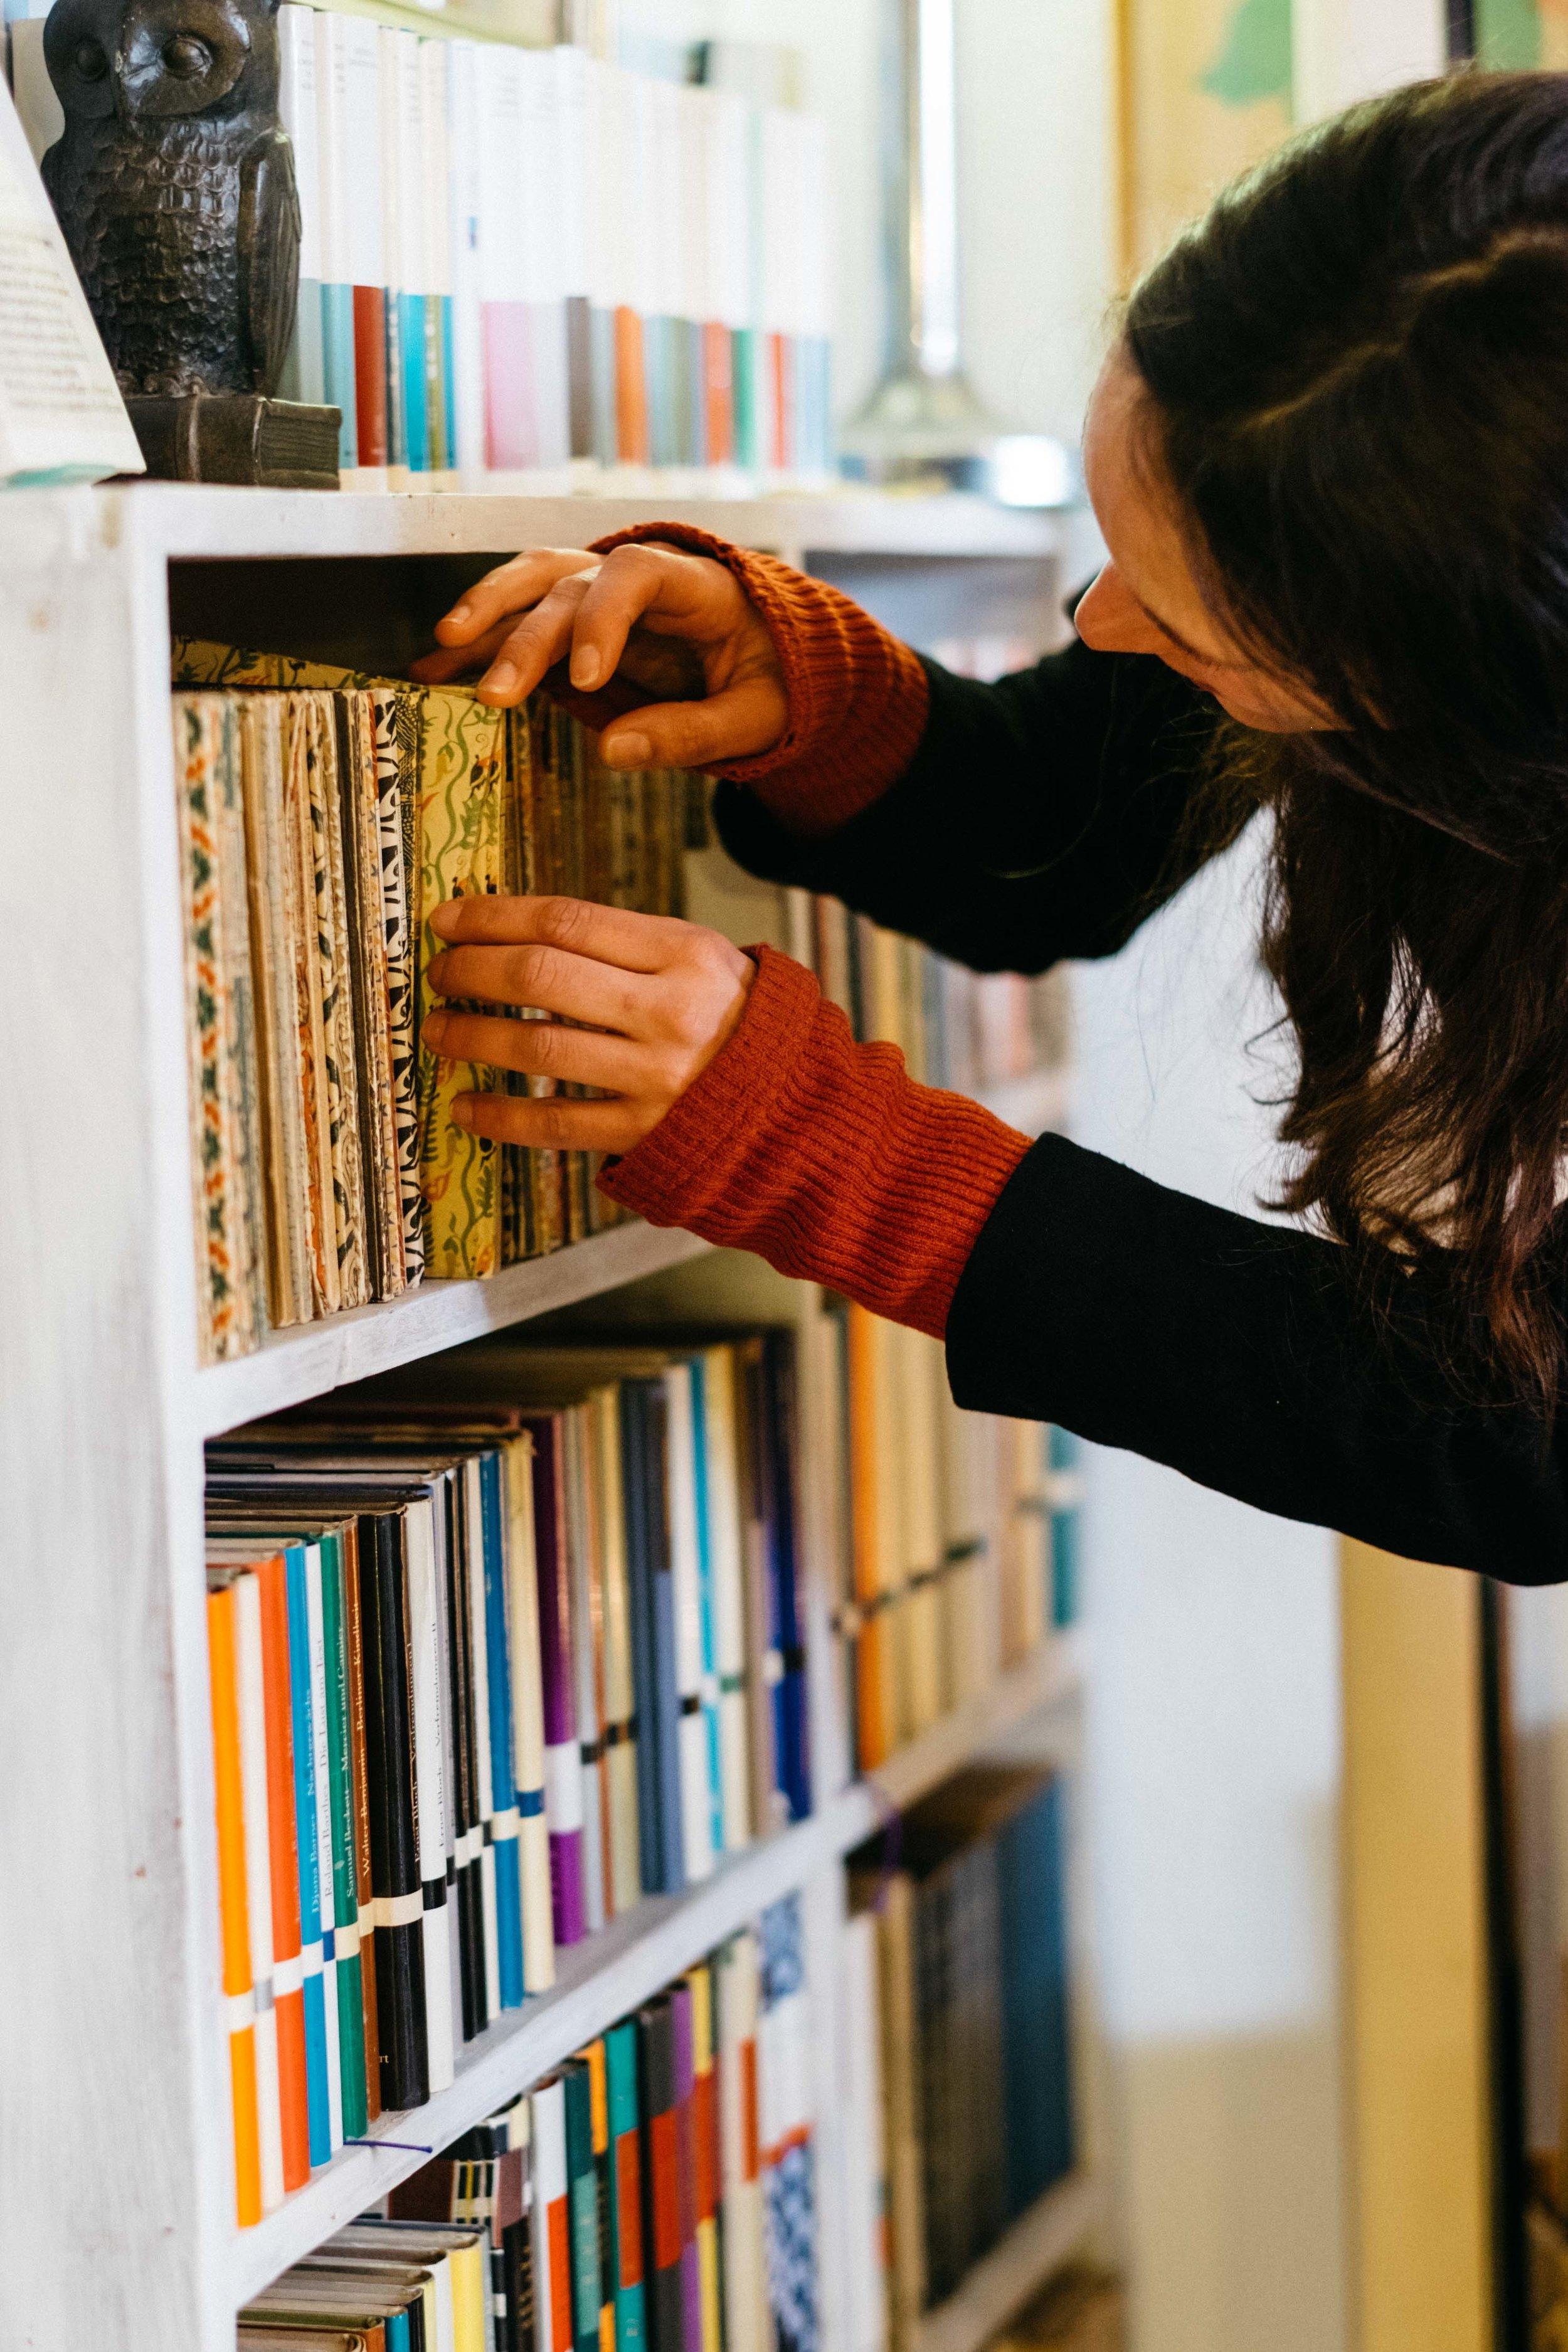 antiquariat-langguth-restaurator-buch-literatur-koeln-wearecity-atheneadiapoulis-32.jpg